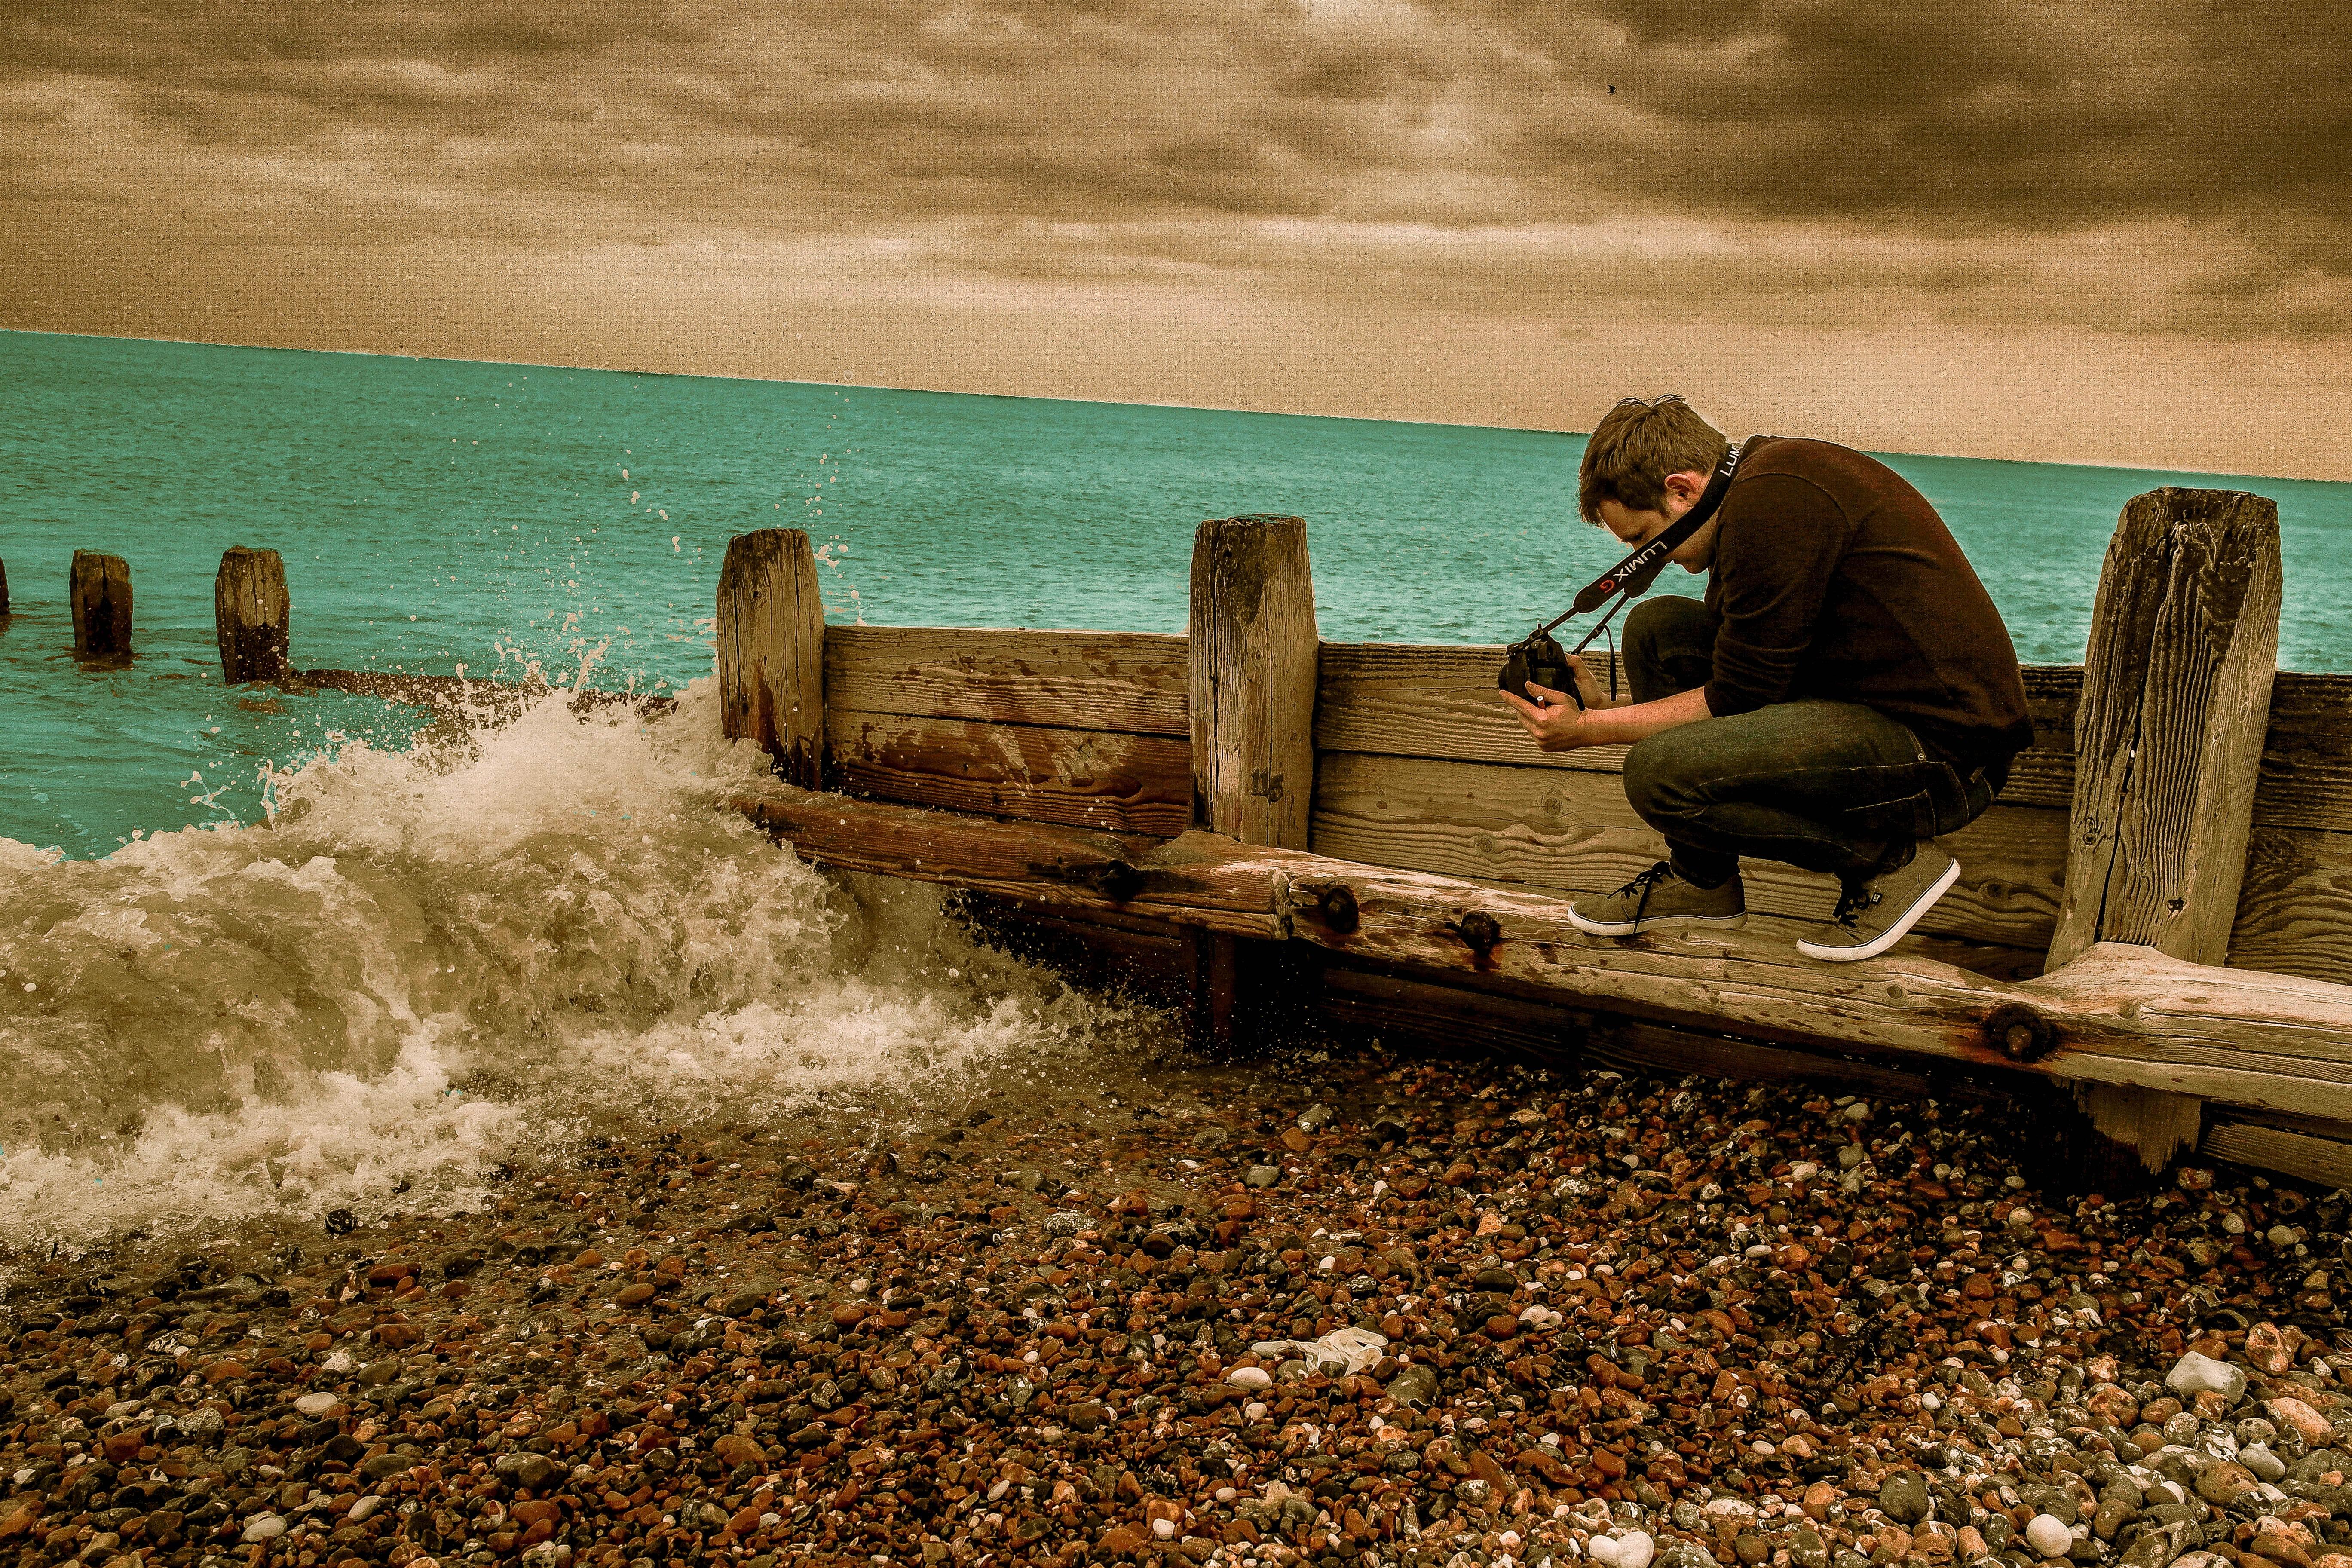 Free Unsplash photo from Oscar Sutton